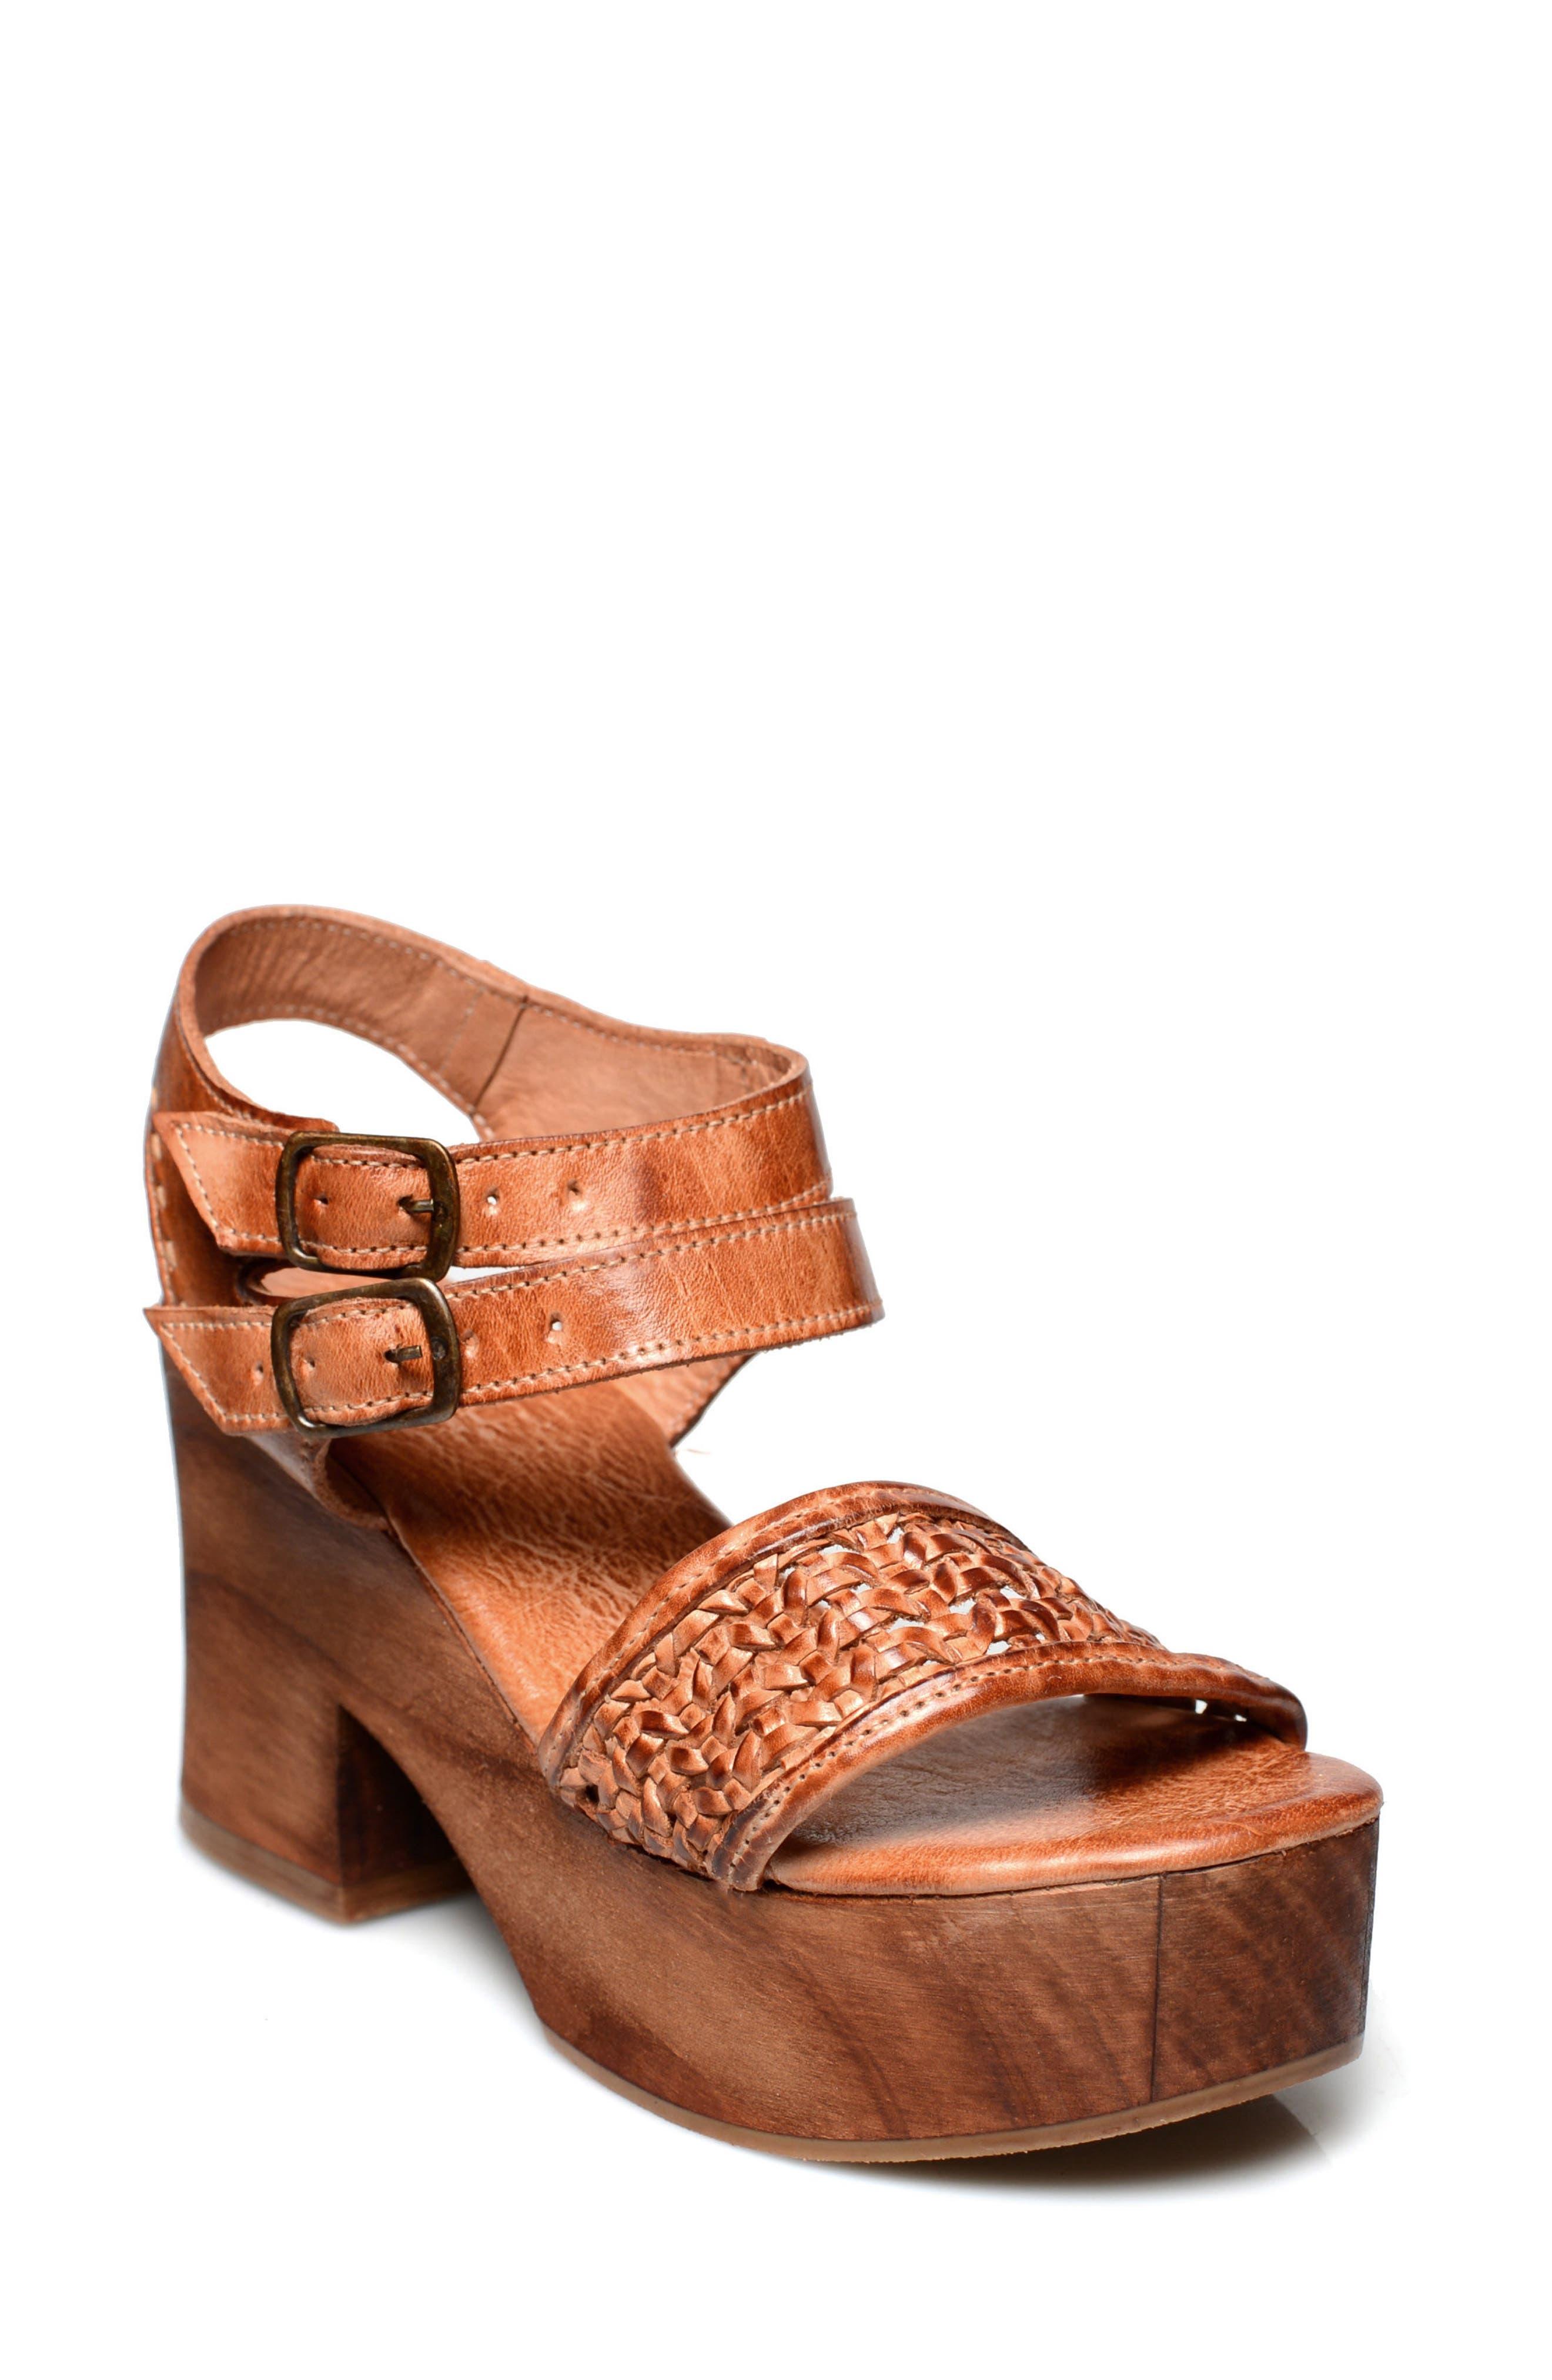 Kenya Platform Sandal,                             Main thumbnail 1, color,                             COGNAC LEATHER